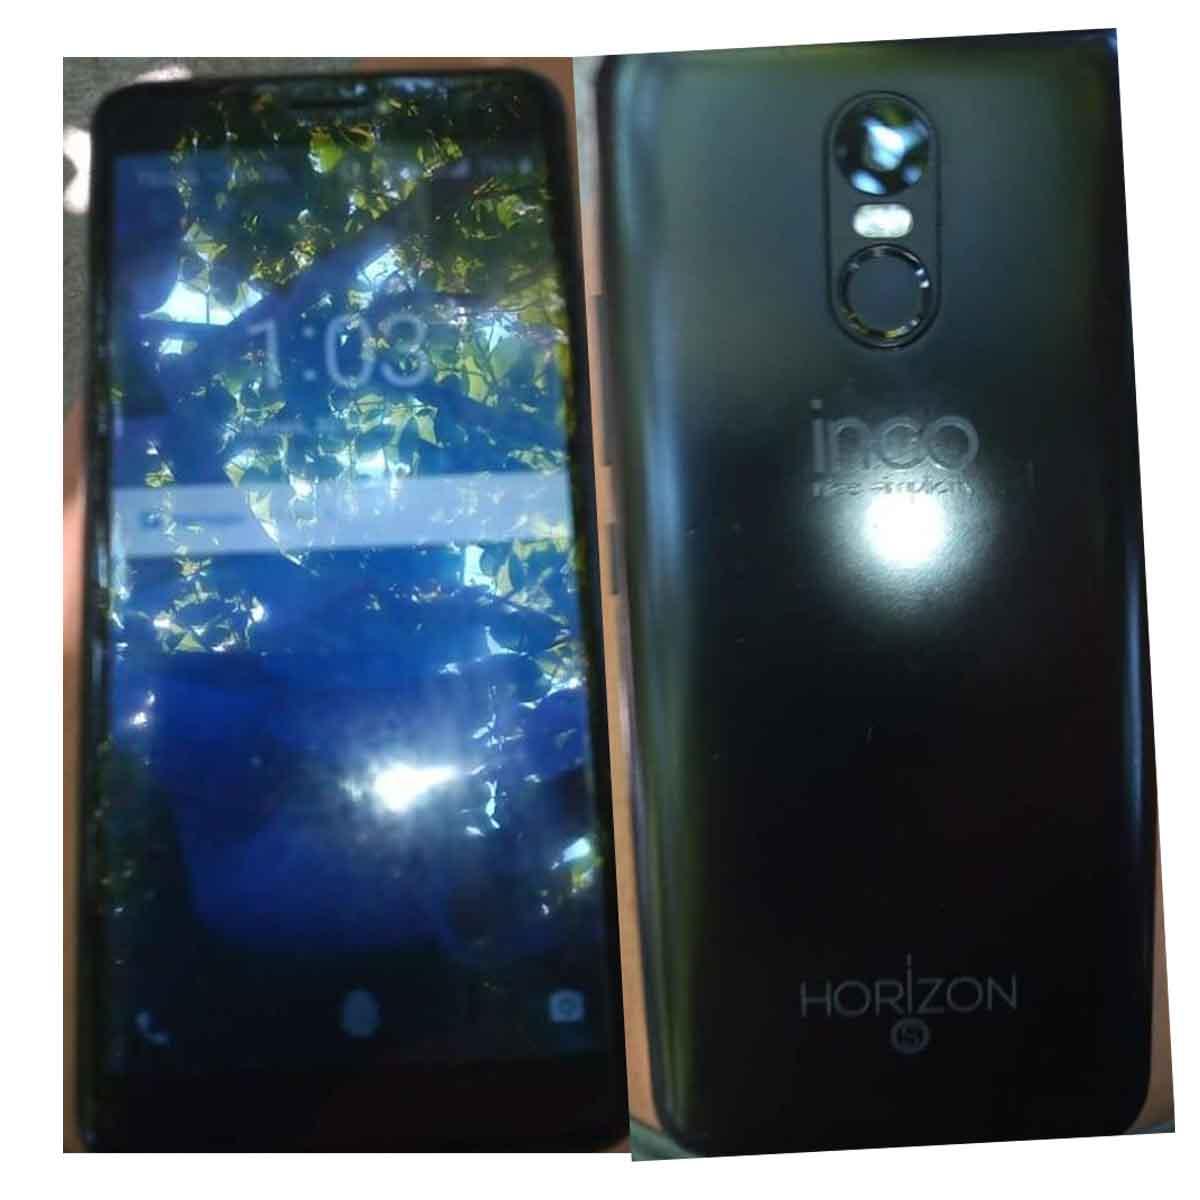 Inco Horizon S Firmware